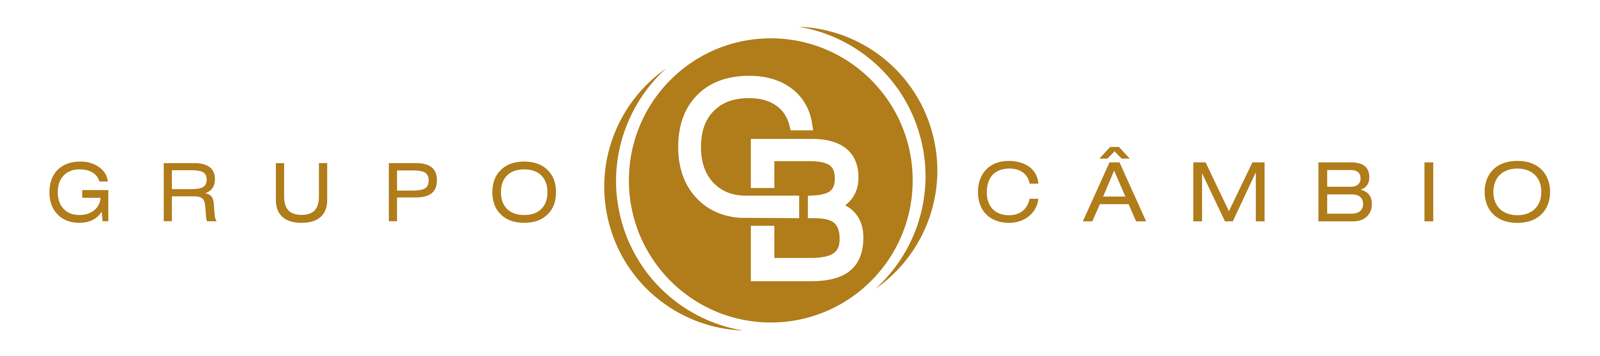 Grupo CB Câmbio